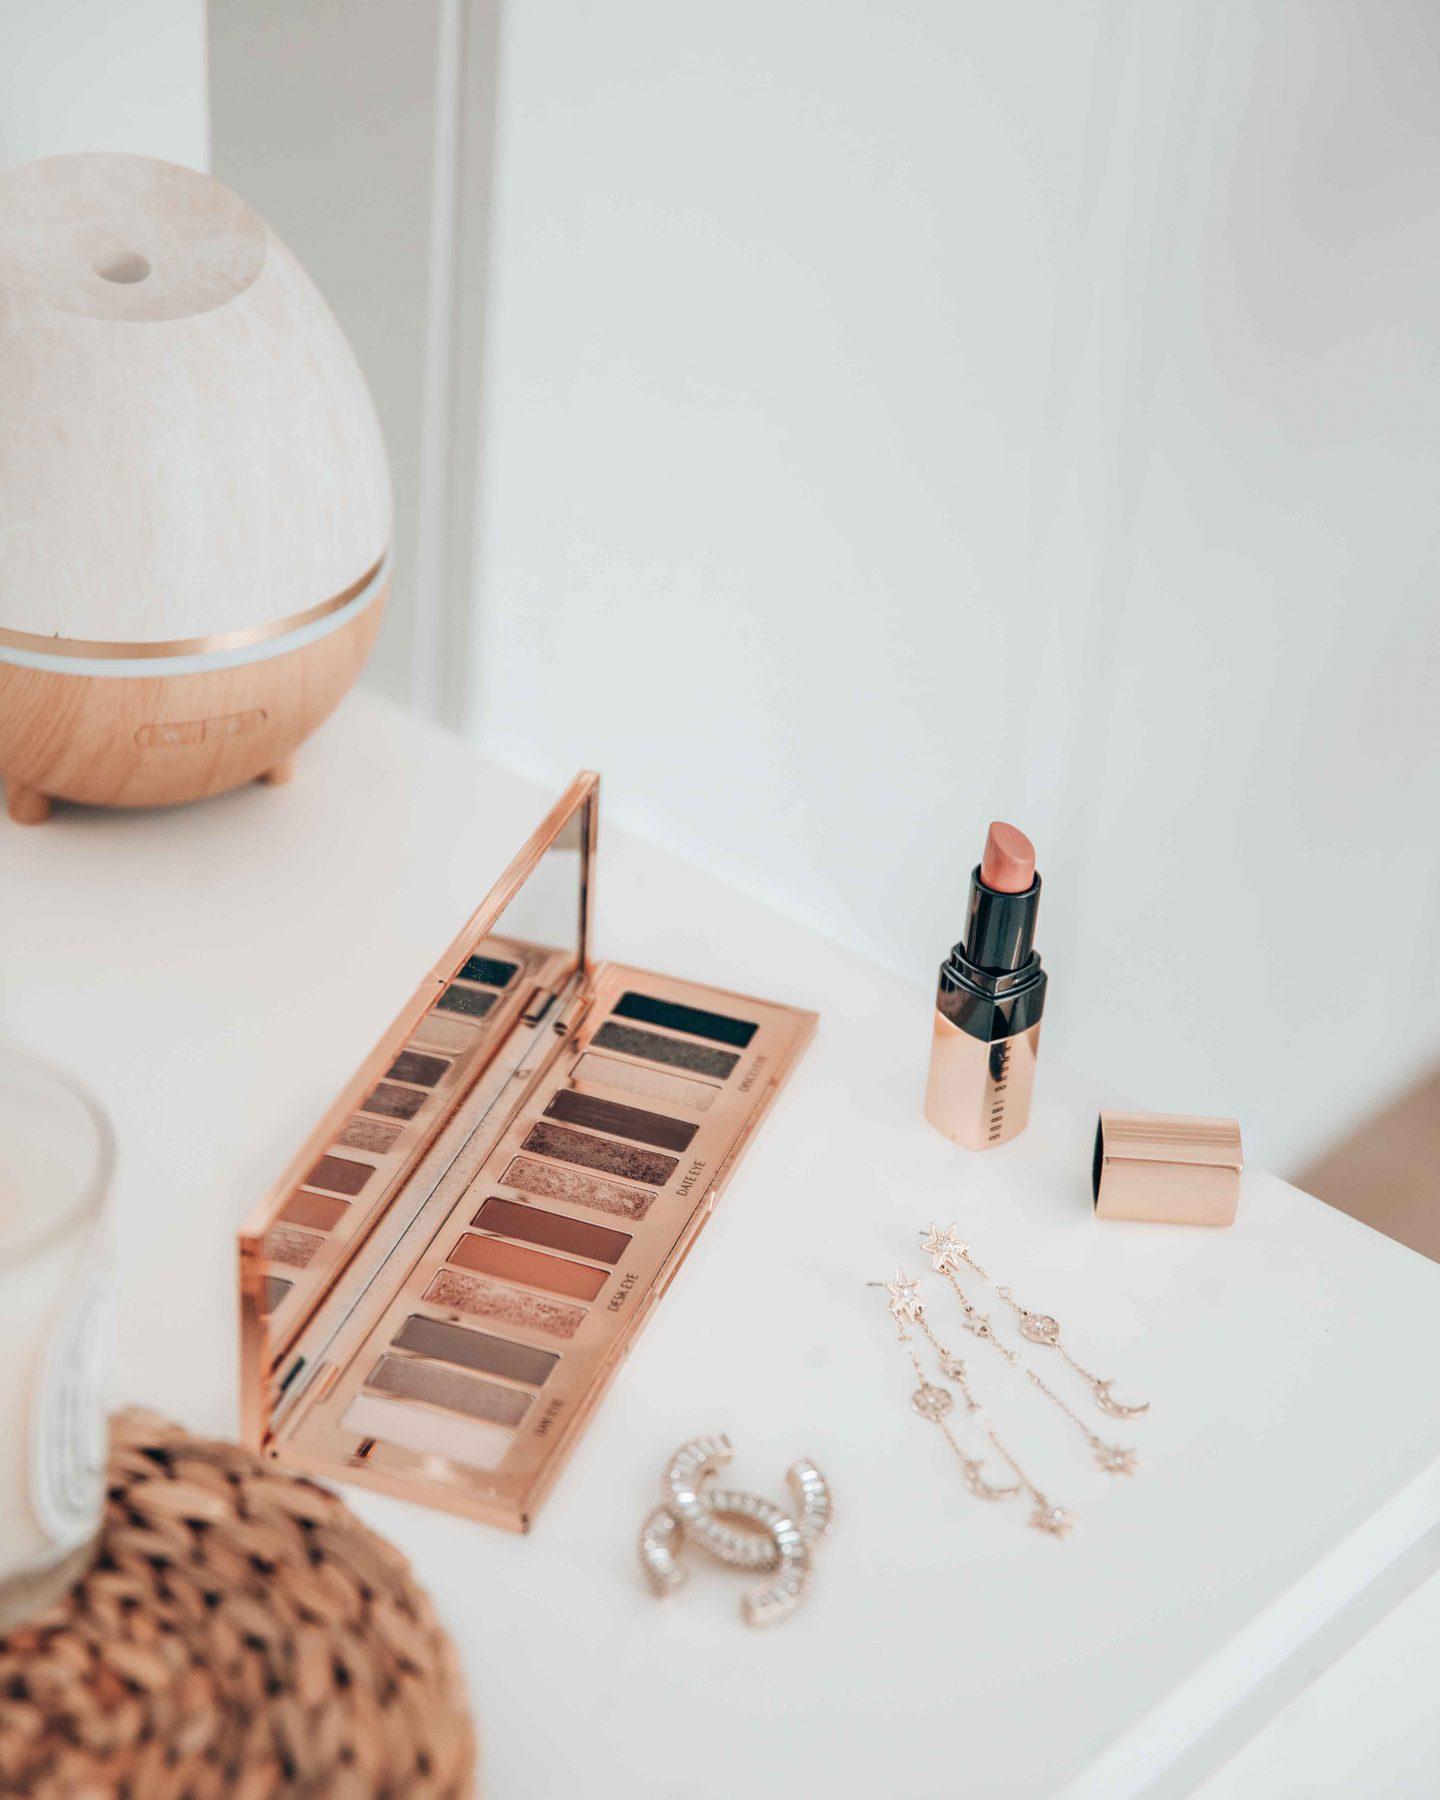 axelle-blanpain-charlotte-tilbury-palette-bobbi-brown-lipstick-chanel-brooch